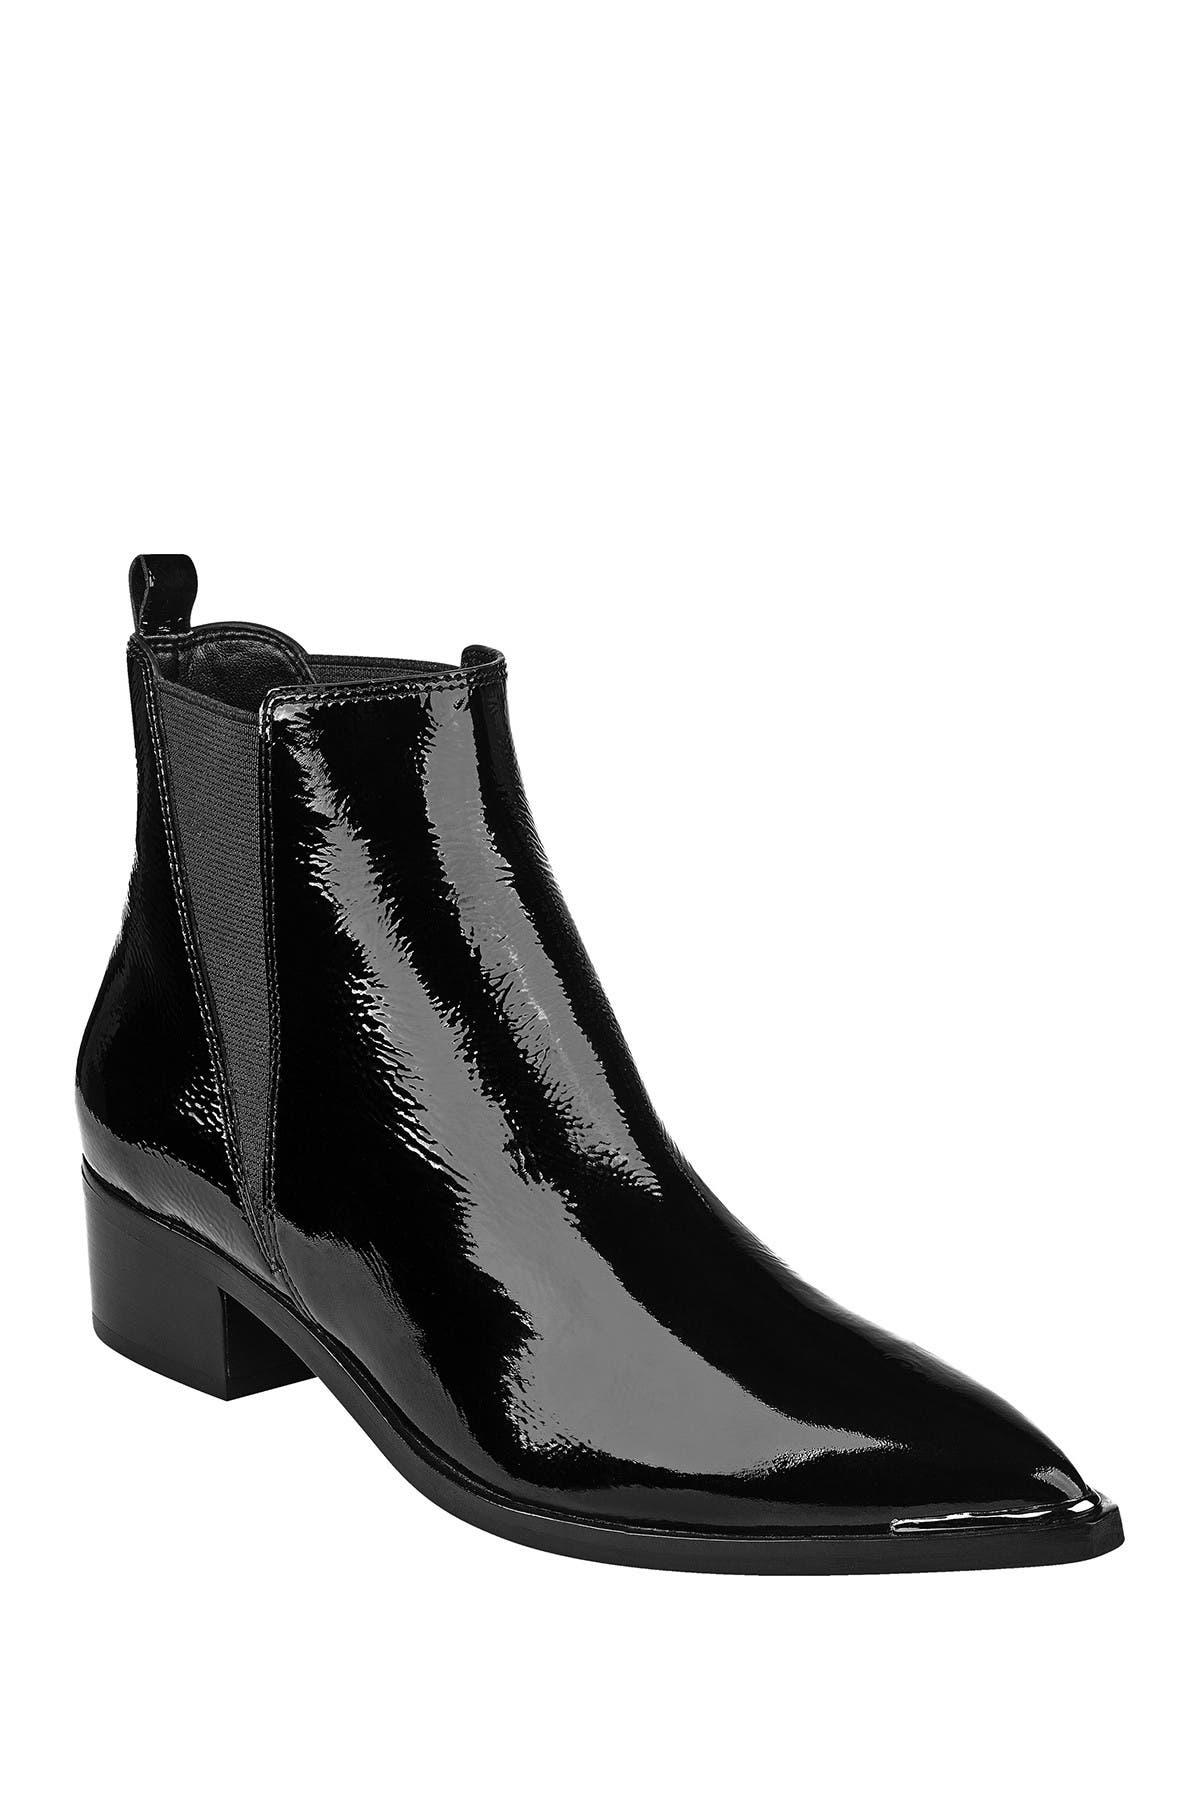 Marc Fisher LTD | Yale Chelsea Boot